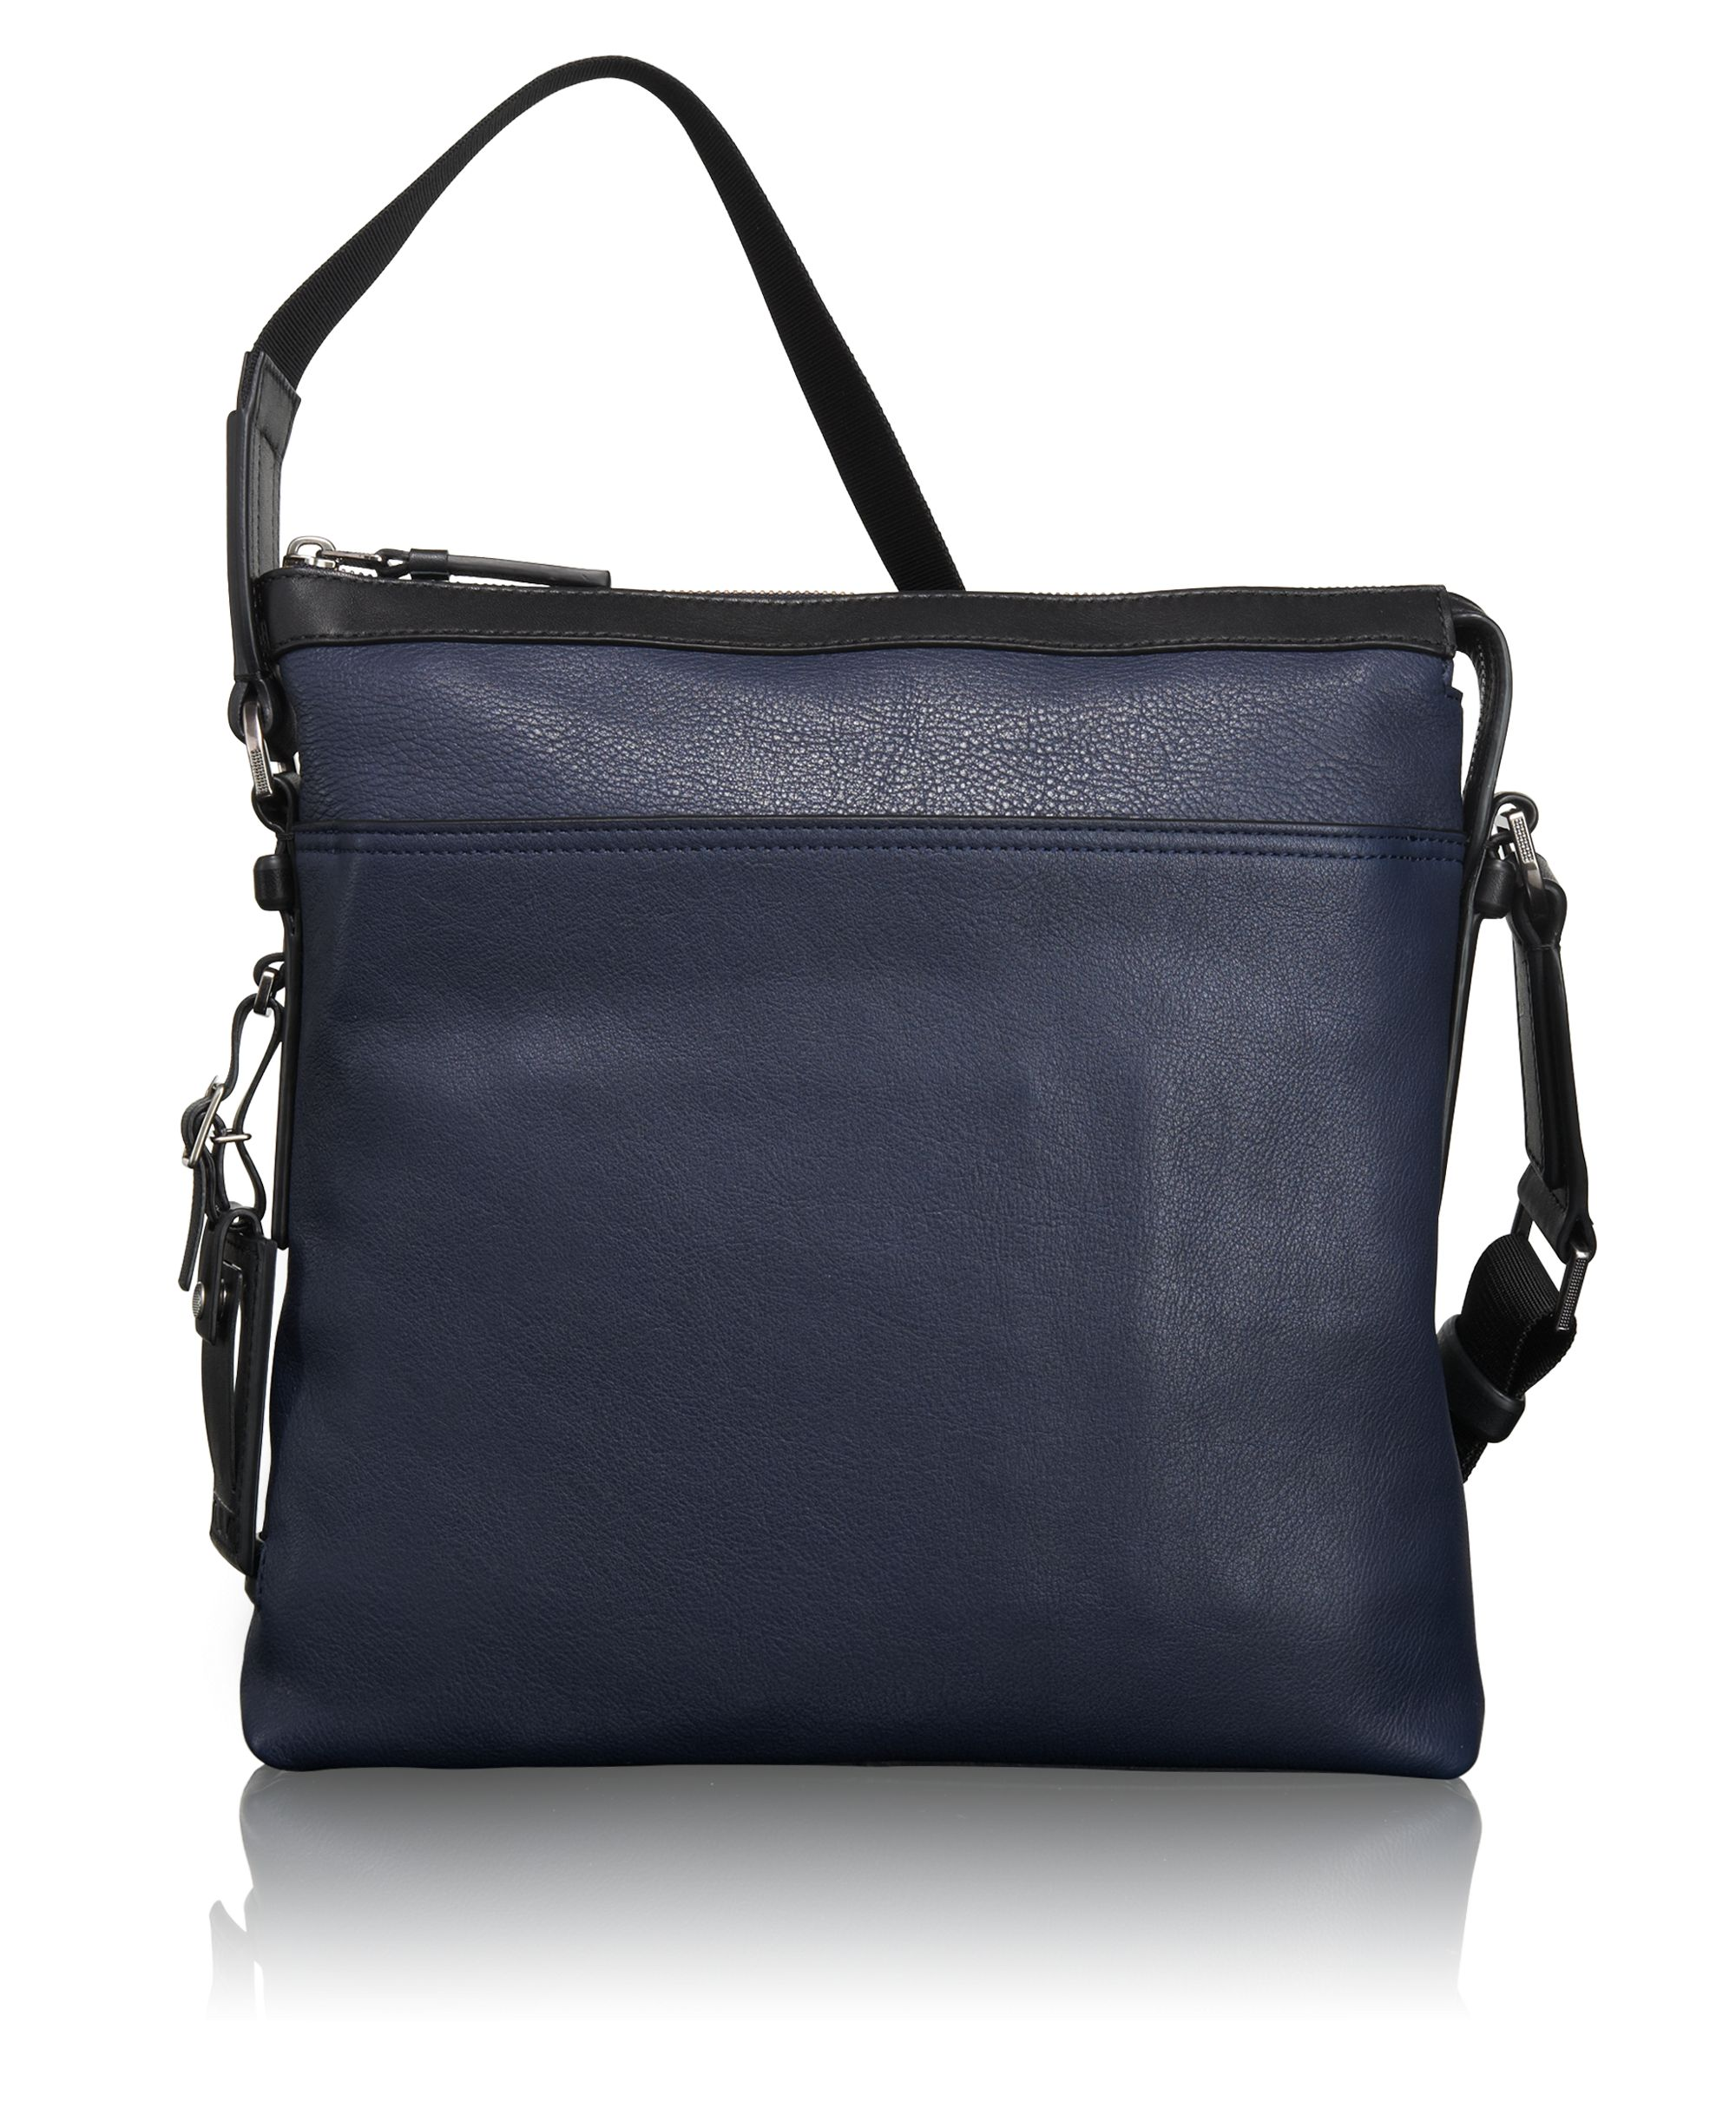 Tumi Crossbody Bag Sale 3